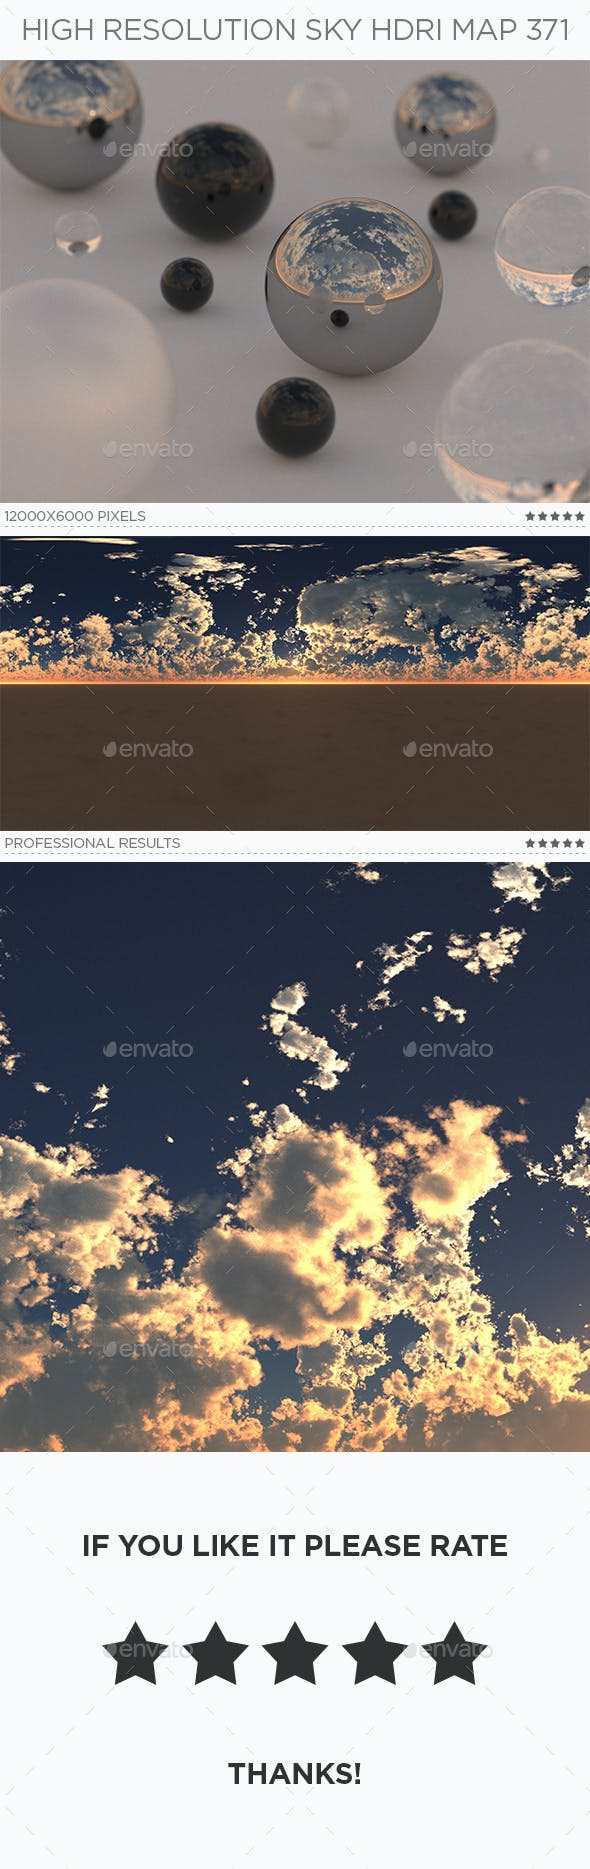 High Resolution Sky HDRi Map 371 - 3DOcean Item for Sale